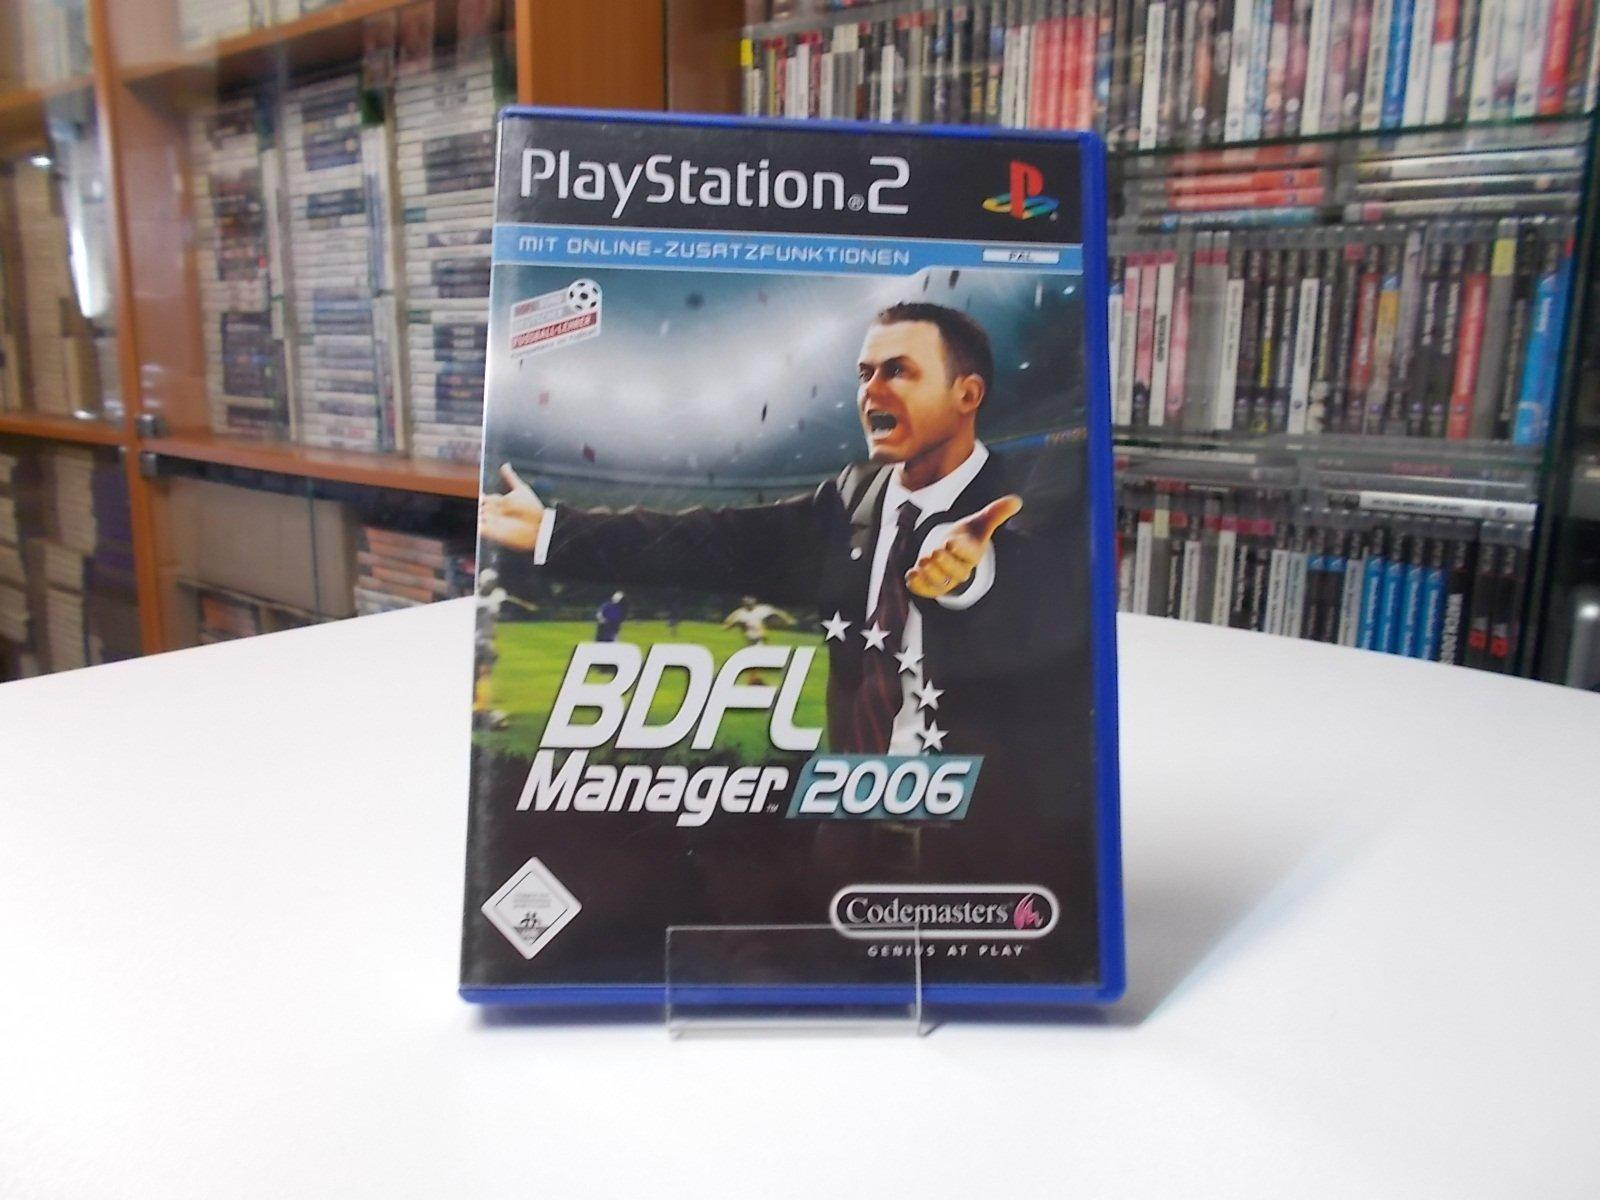 BDFL MANAGER 2006 - GRA Ps2 - Opole 0509